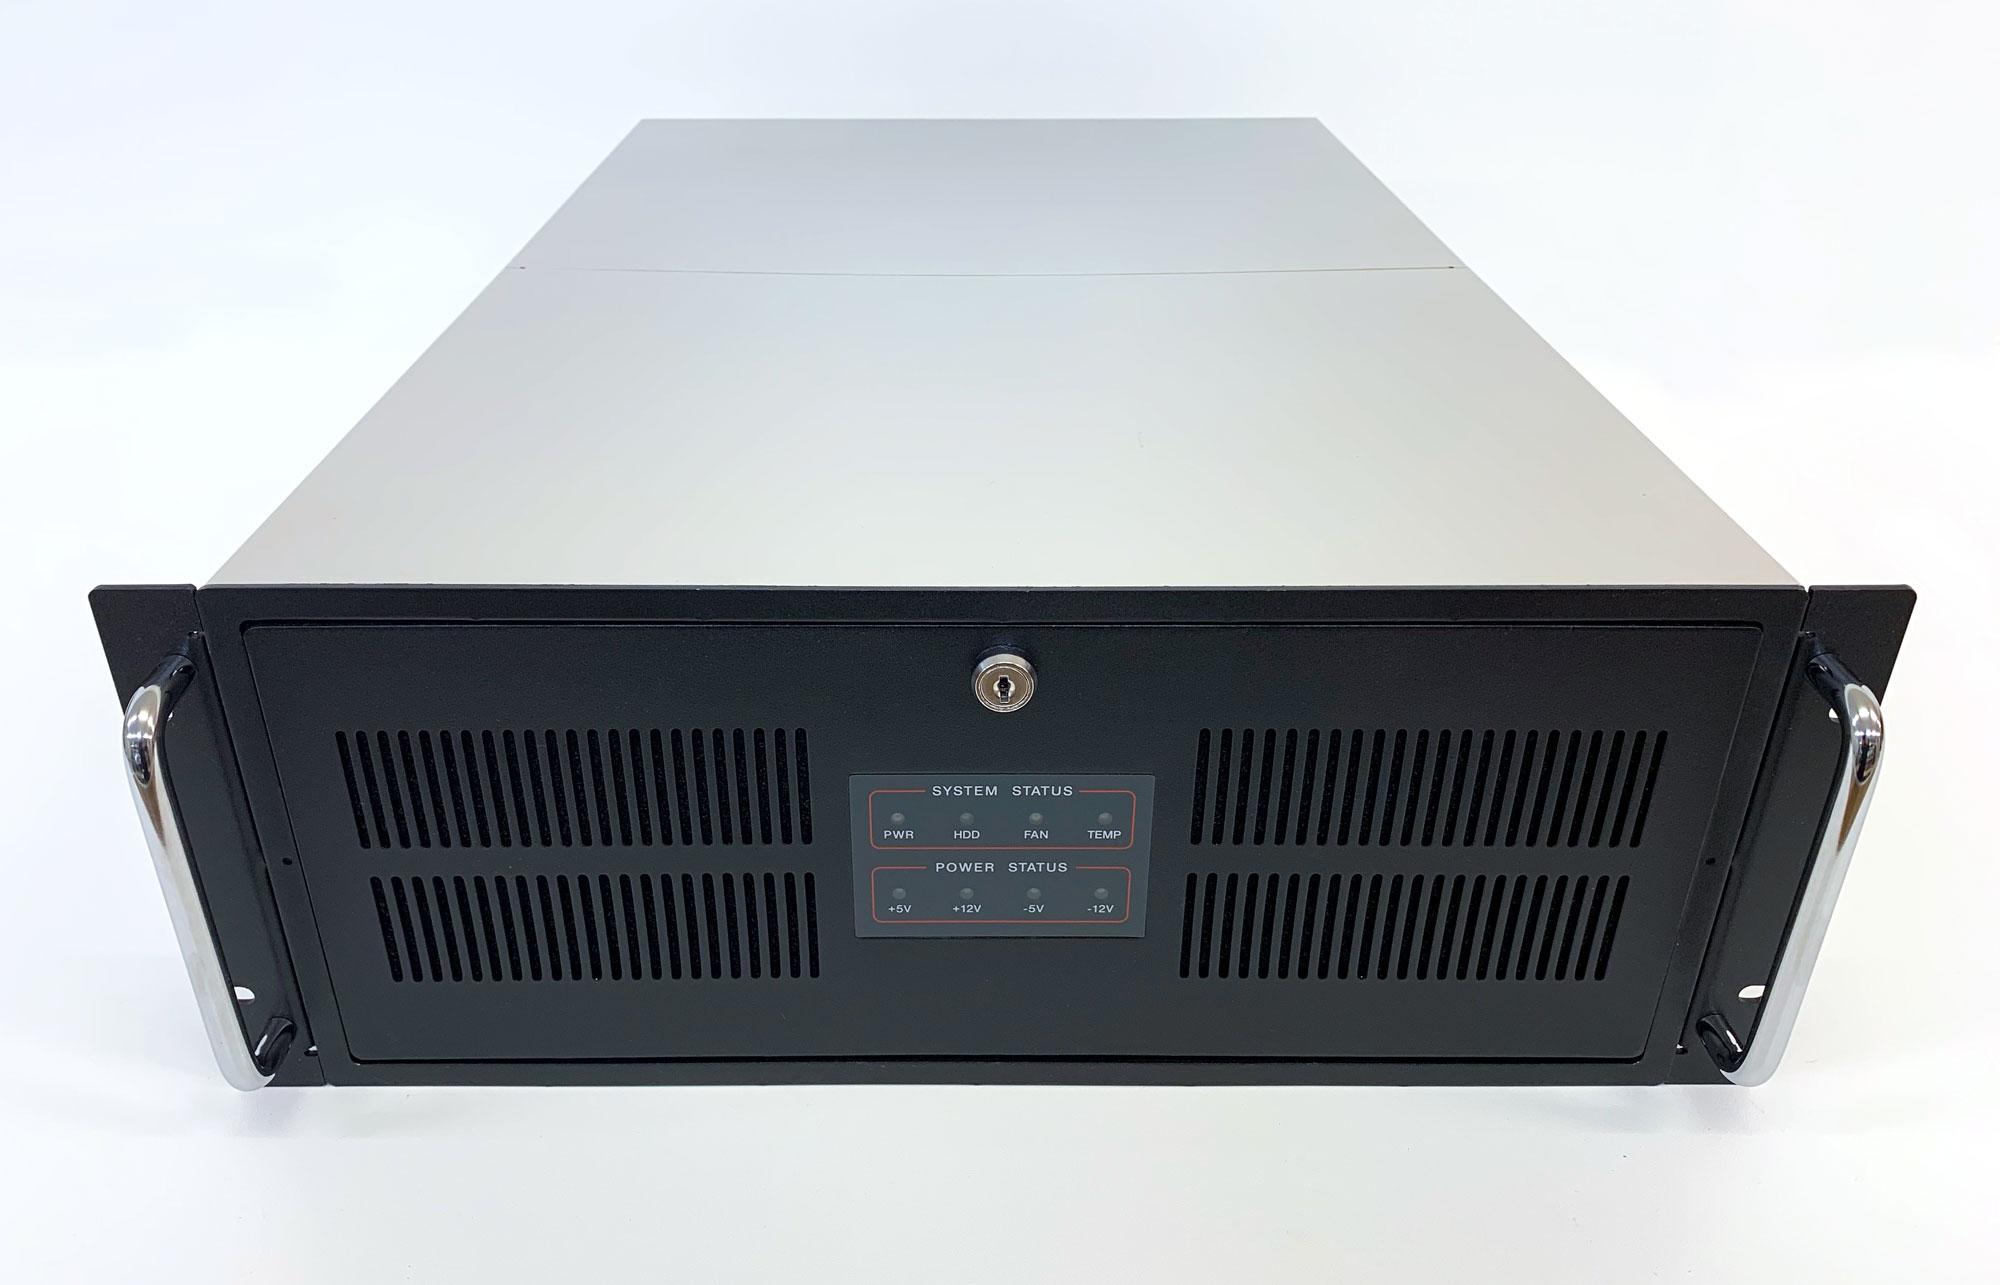 IPC-623MB - 4HE Industrie PC Gehäuse, lange Version